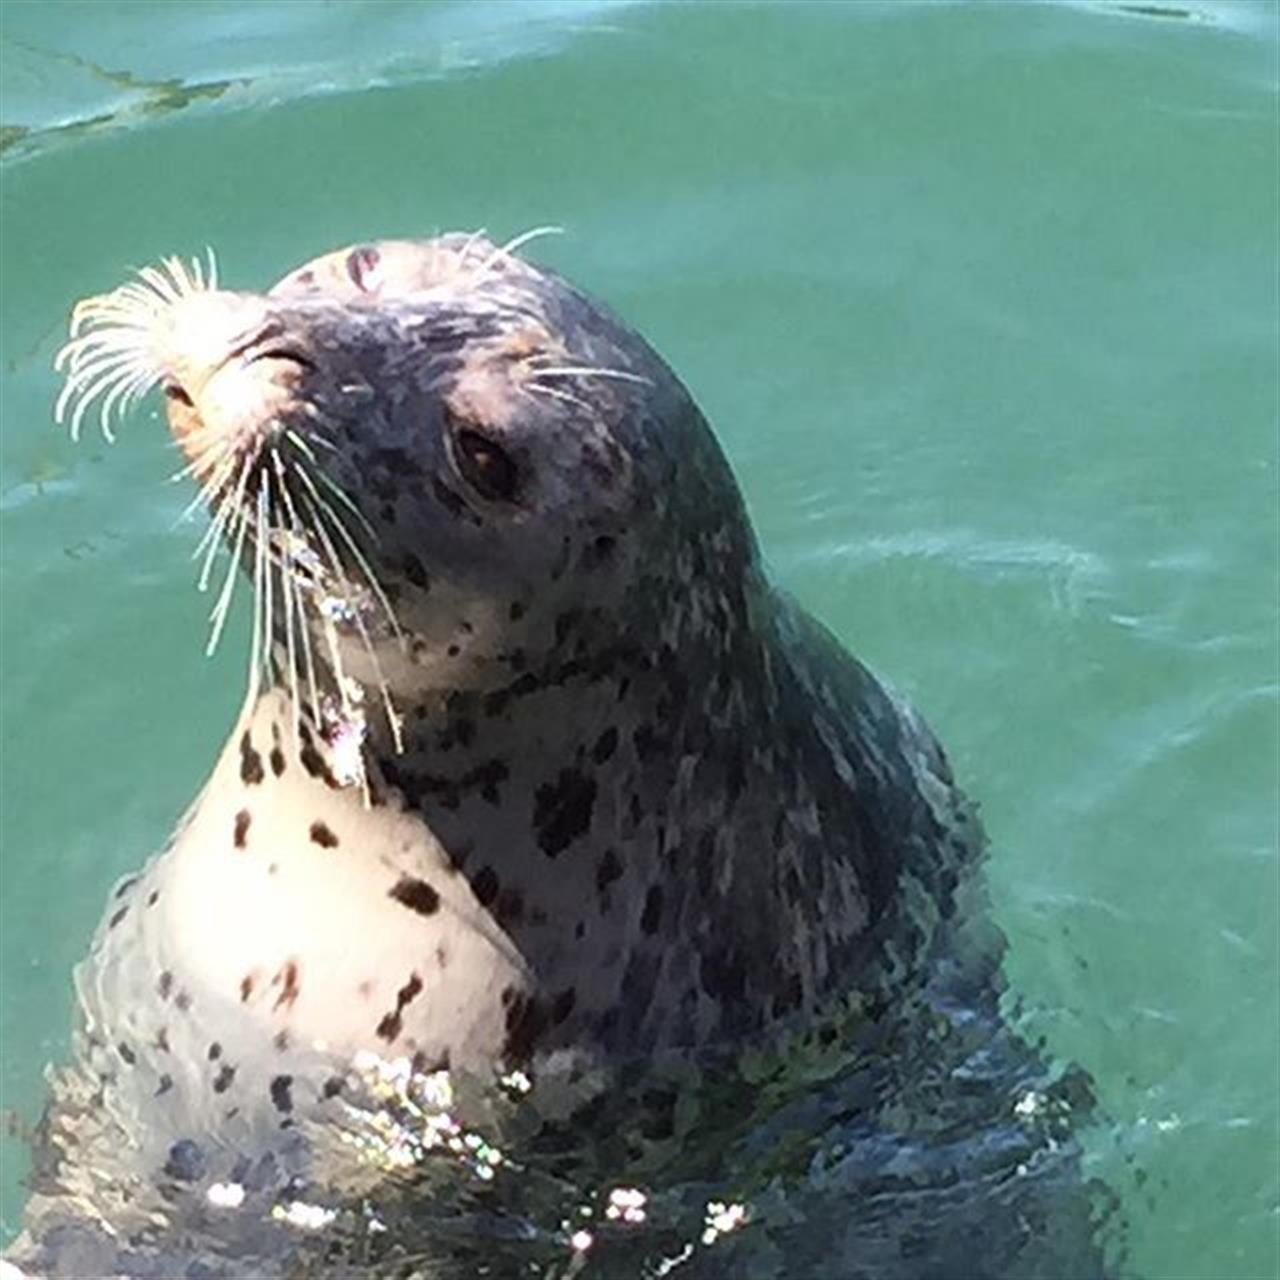 #lunch companion #my backyard #oakbay #oakbaymarina #LeadingRElocal #realestate #realtorlife #realestateagent #seals